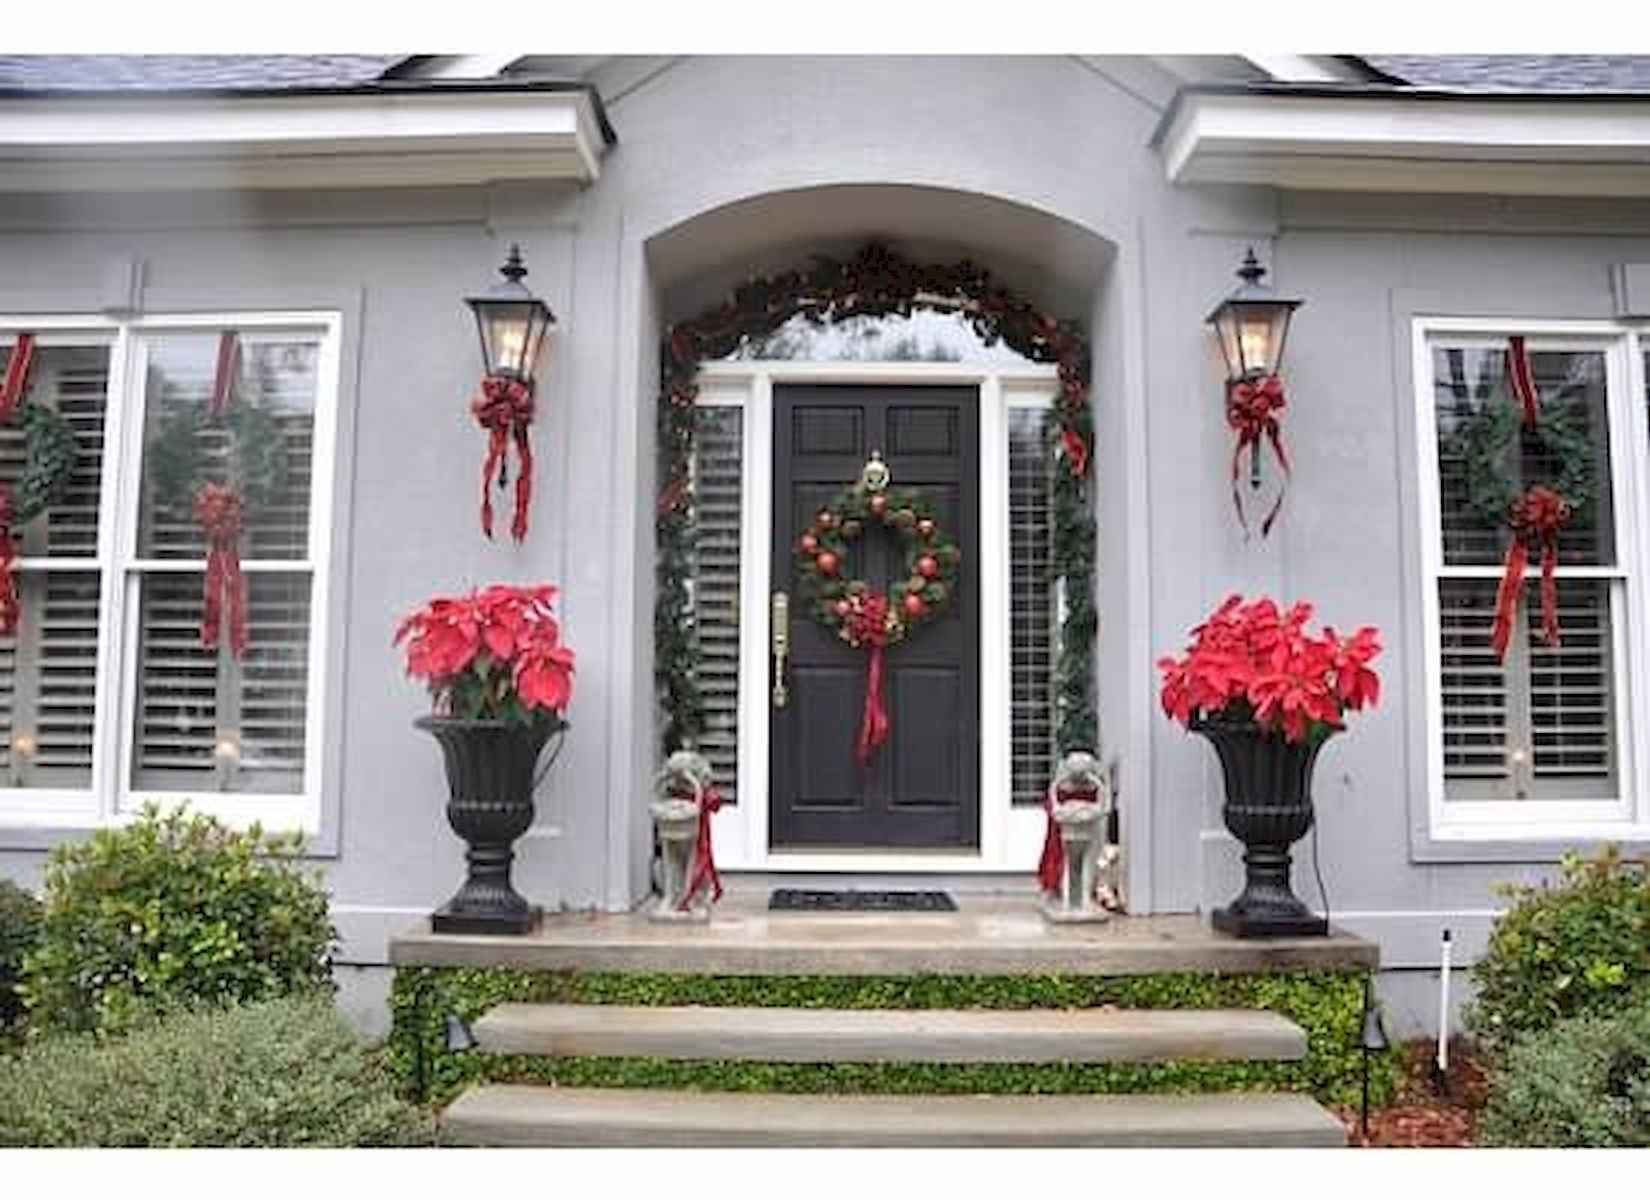 40 amazing outdoor christmas decorations ideas (10)